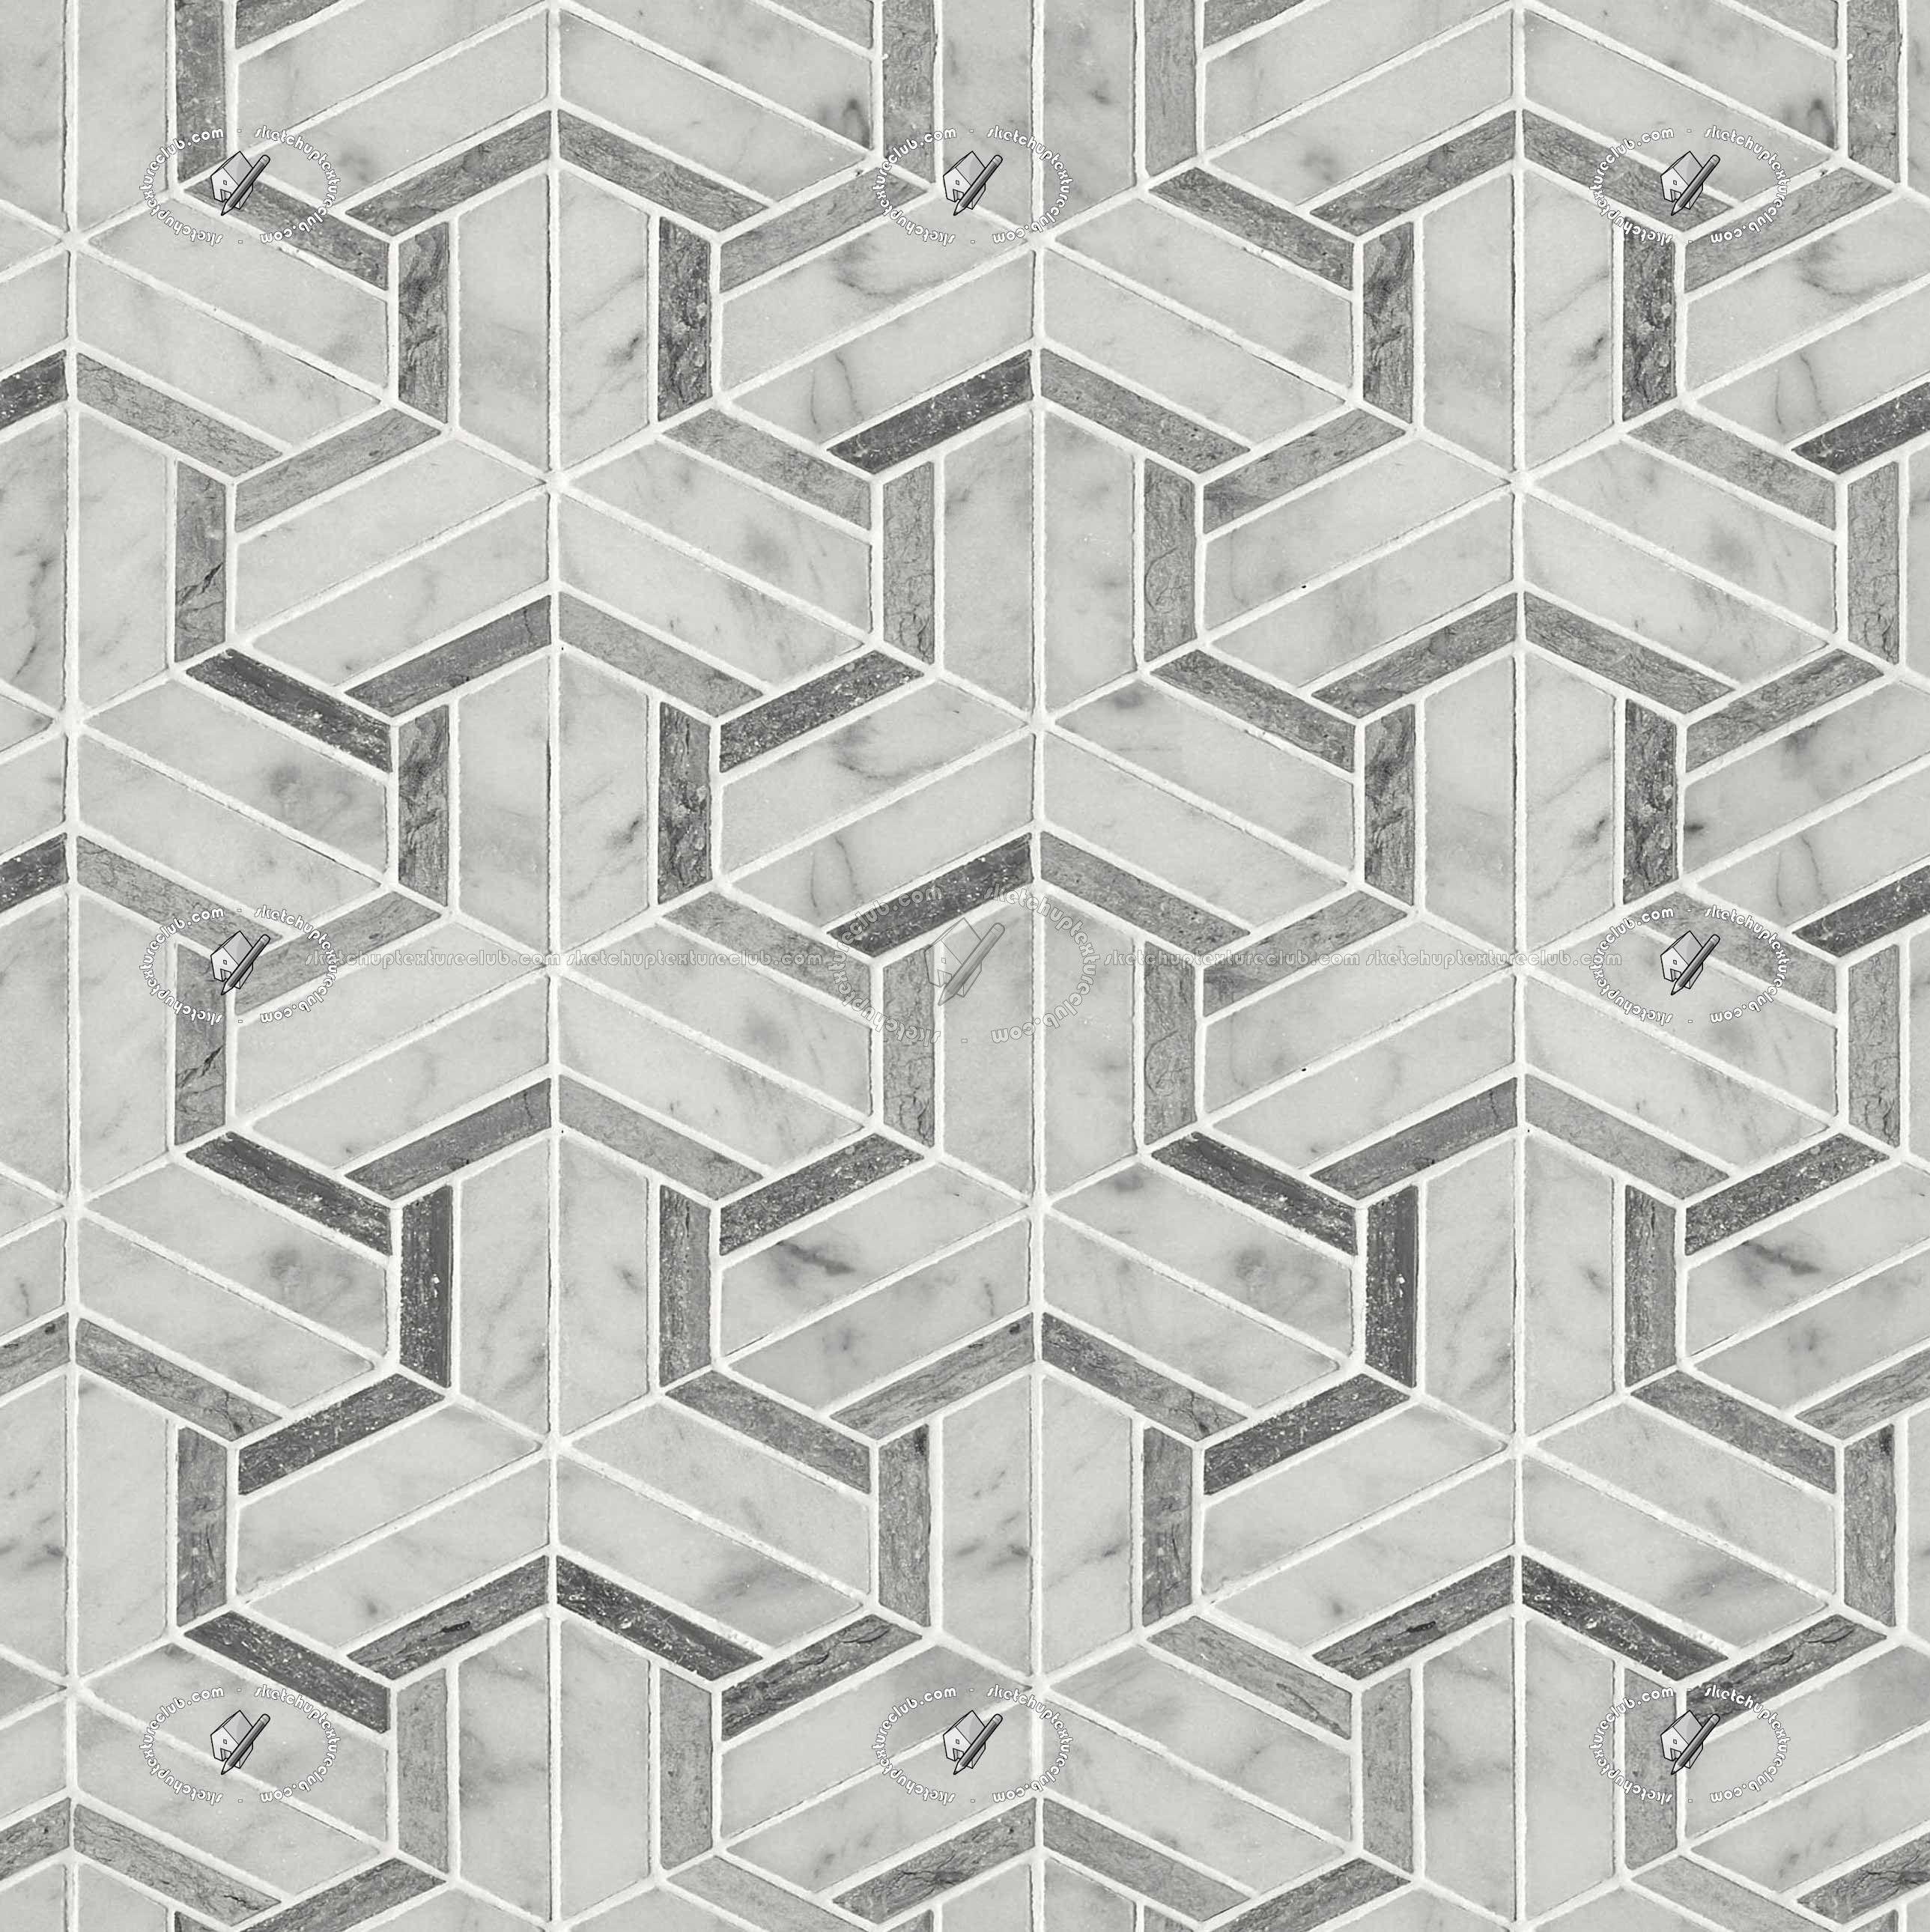 Marble Floor Tiles Geometric Patterns Texture Seamless Geometric Floor Geometric Tiles Tile Floor